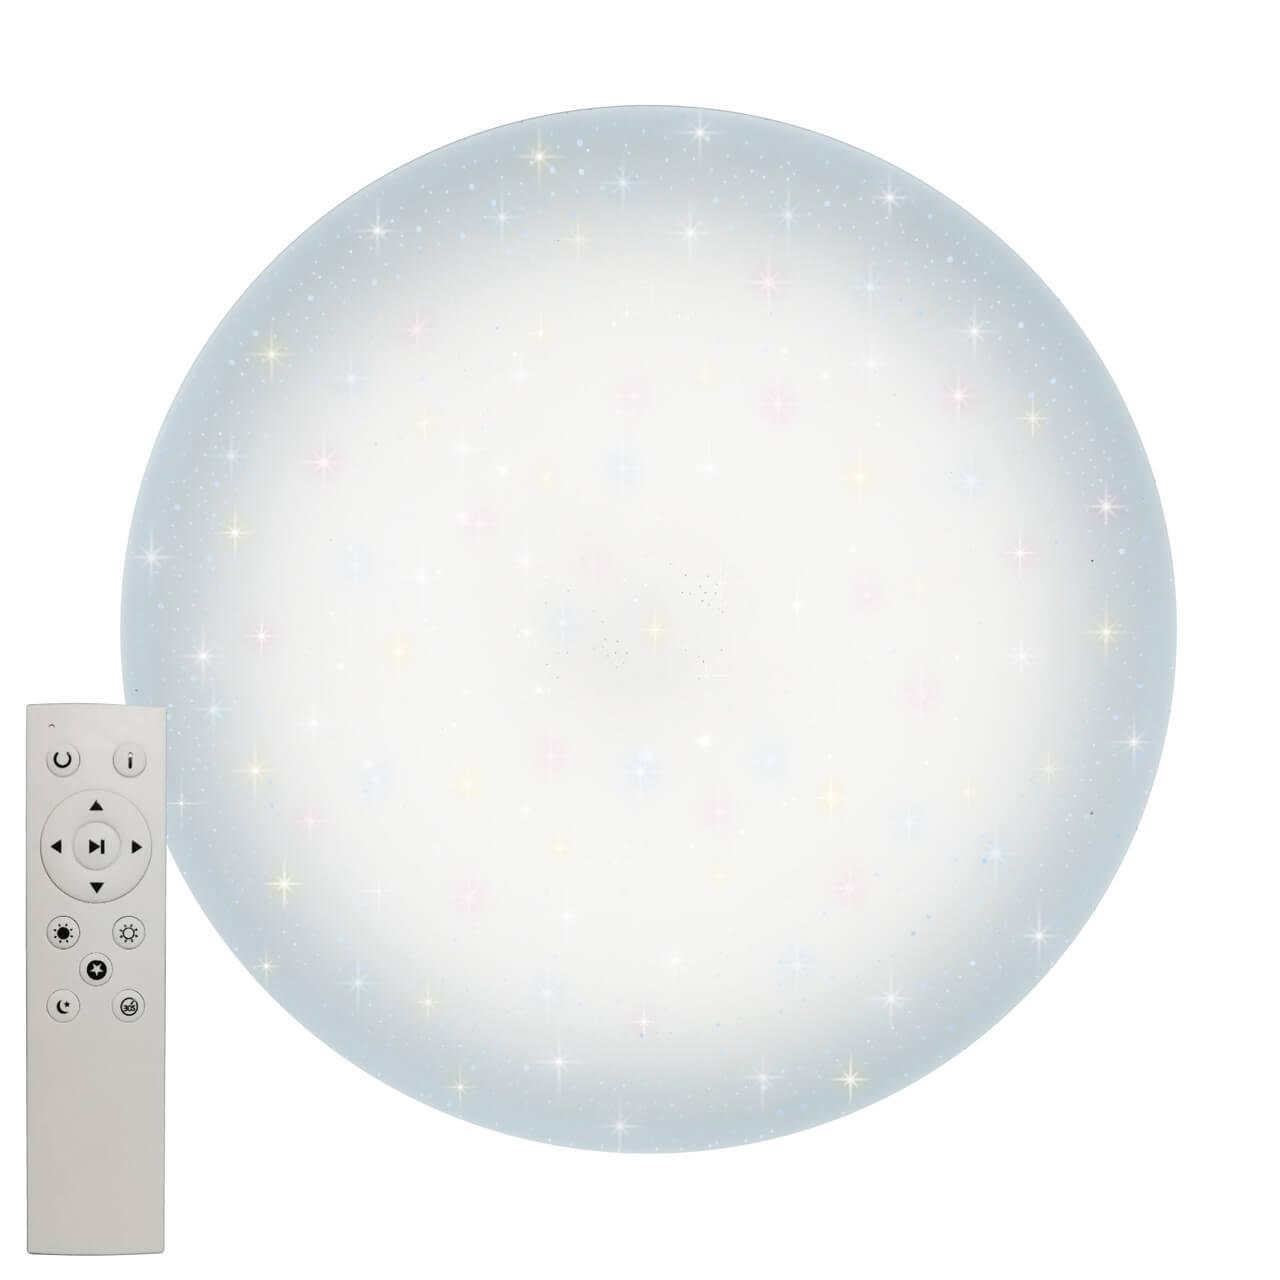 цена на Светильник Uniel ULI-D214 96W/SW/50 Saturn Saturn